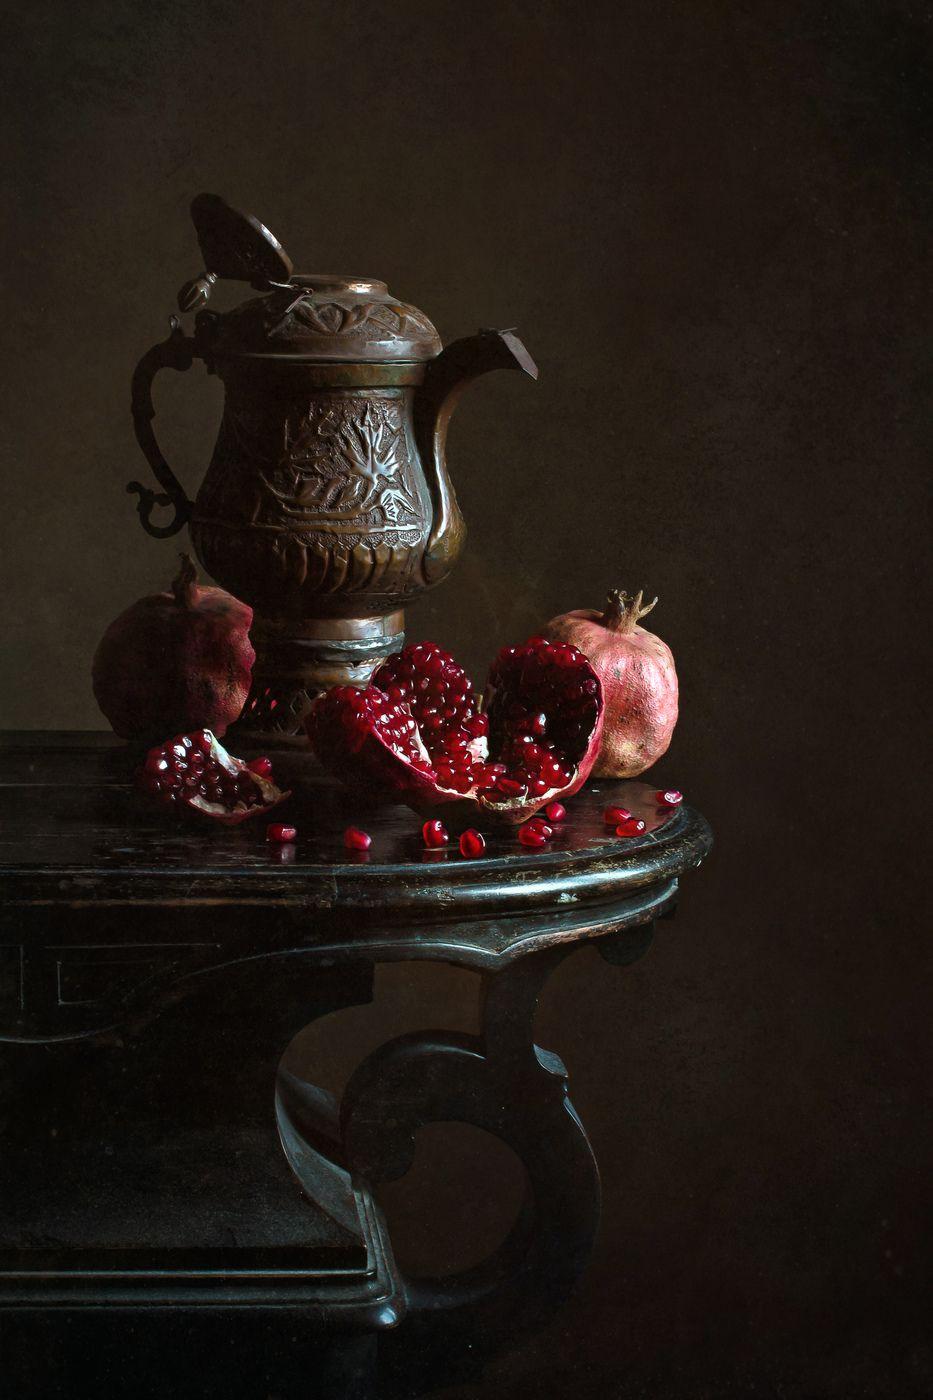 Анна Петина #Still #Life #Photography | Still life ...